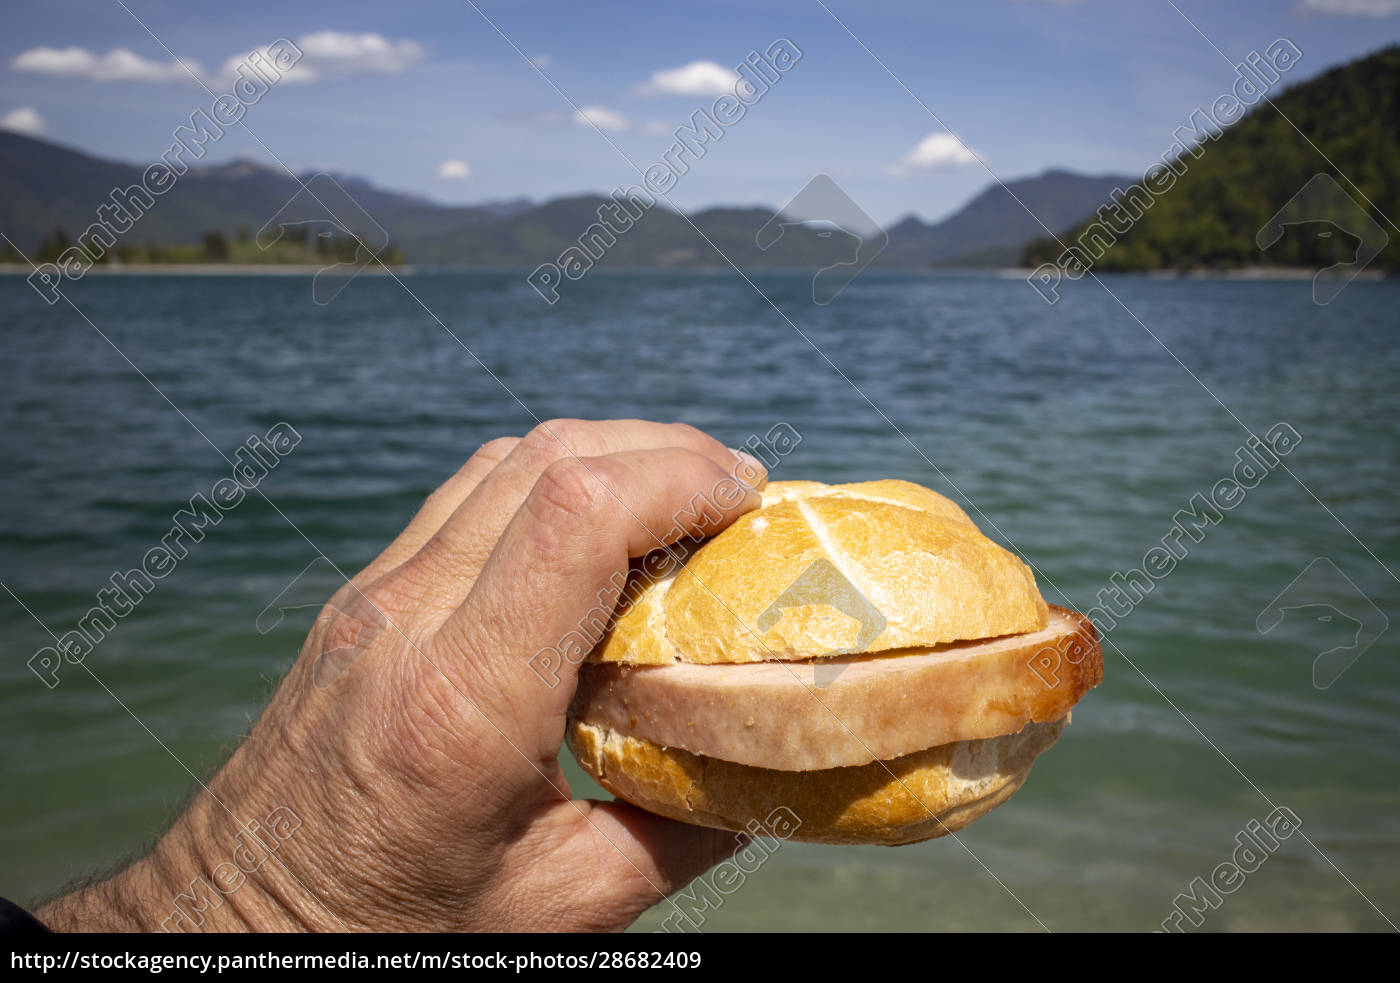 meat, loaf, bun, at, walchensee - 28682409